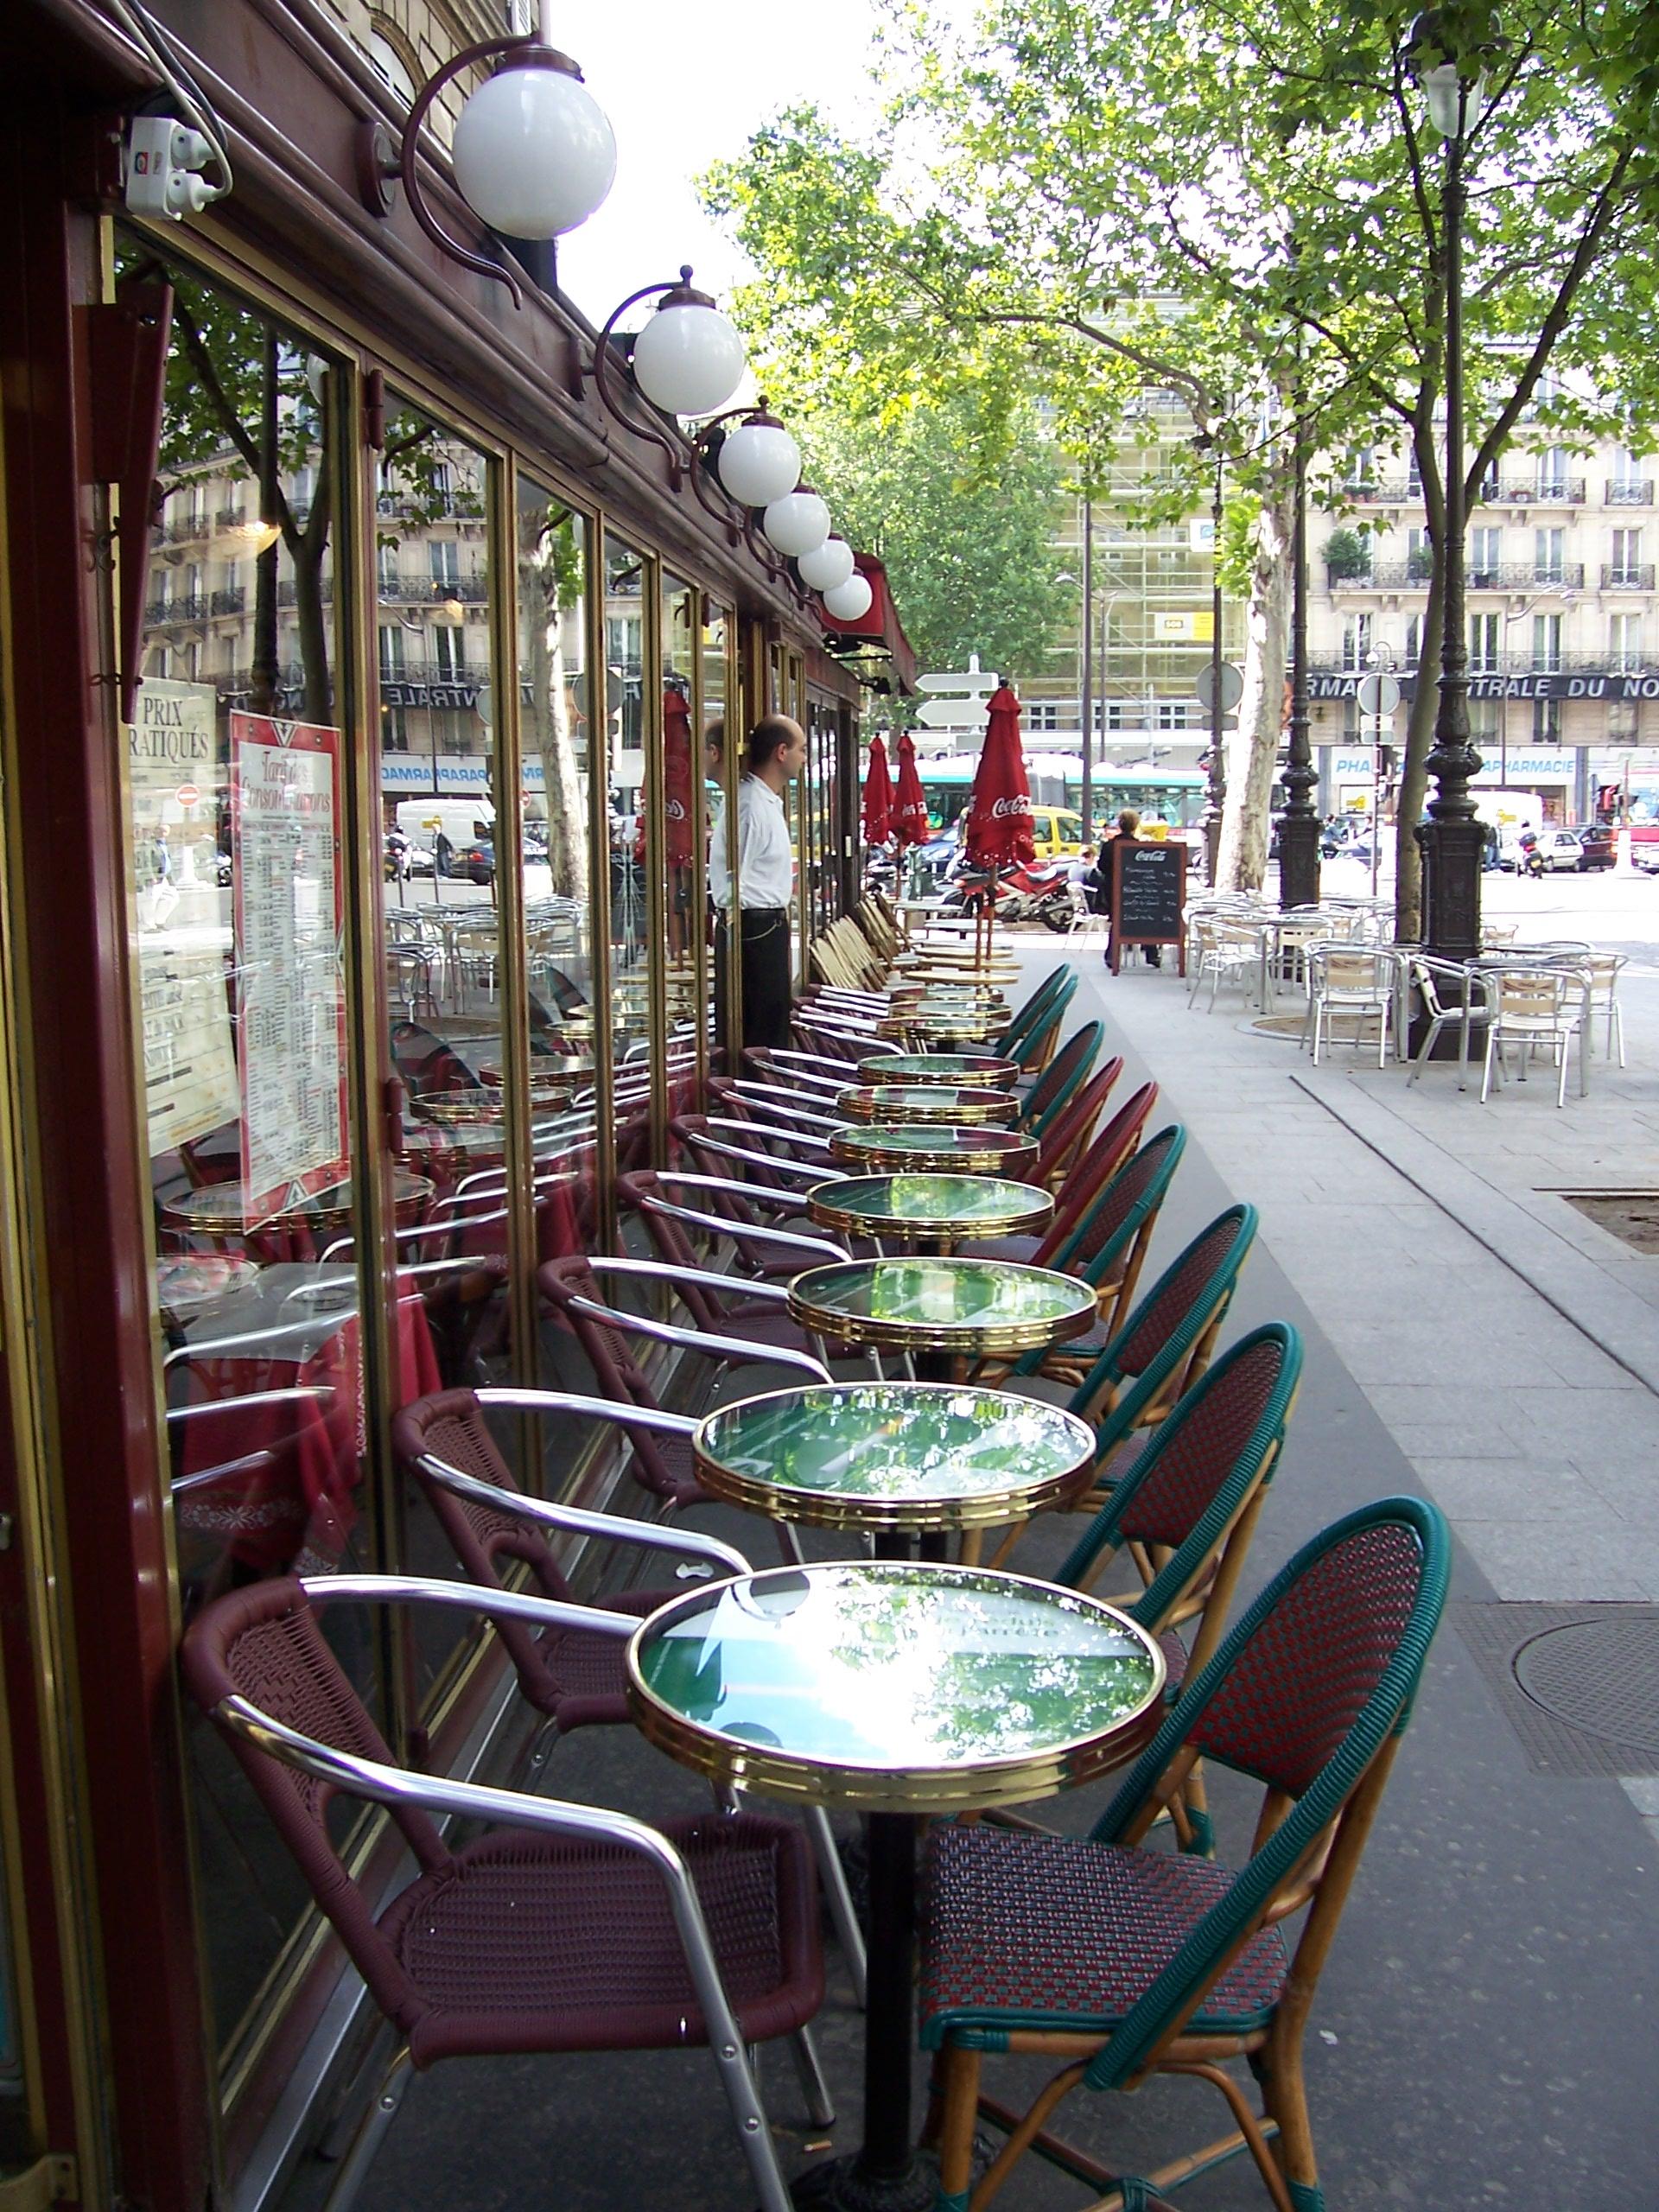 Caf De Paris Assistance T Ef Bf Bdl Ef Bf Bdphone